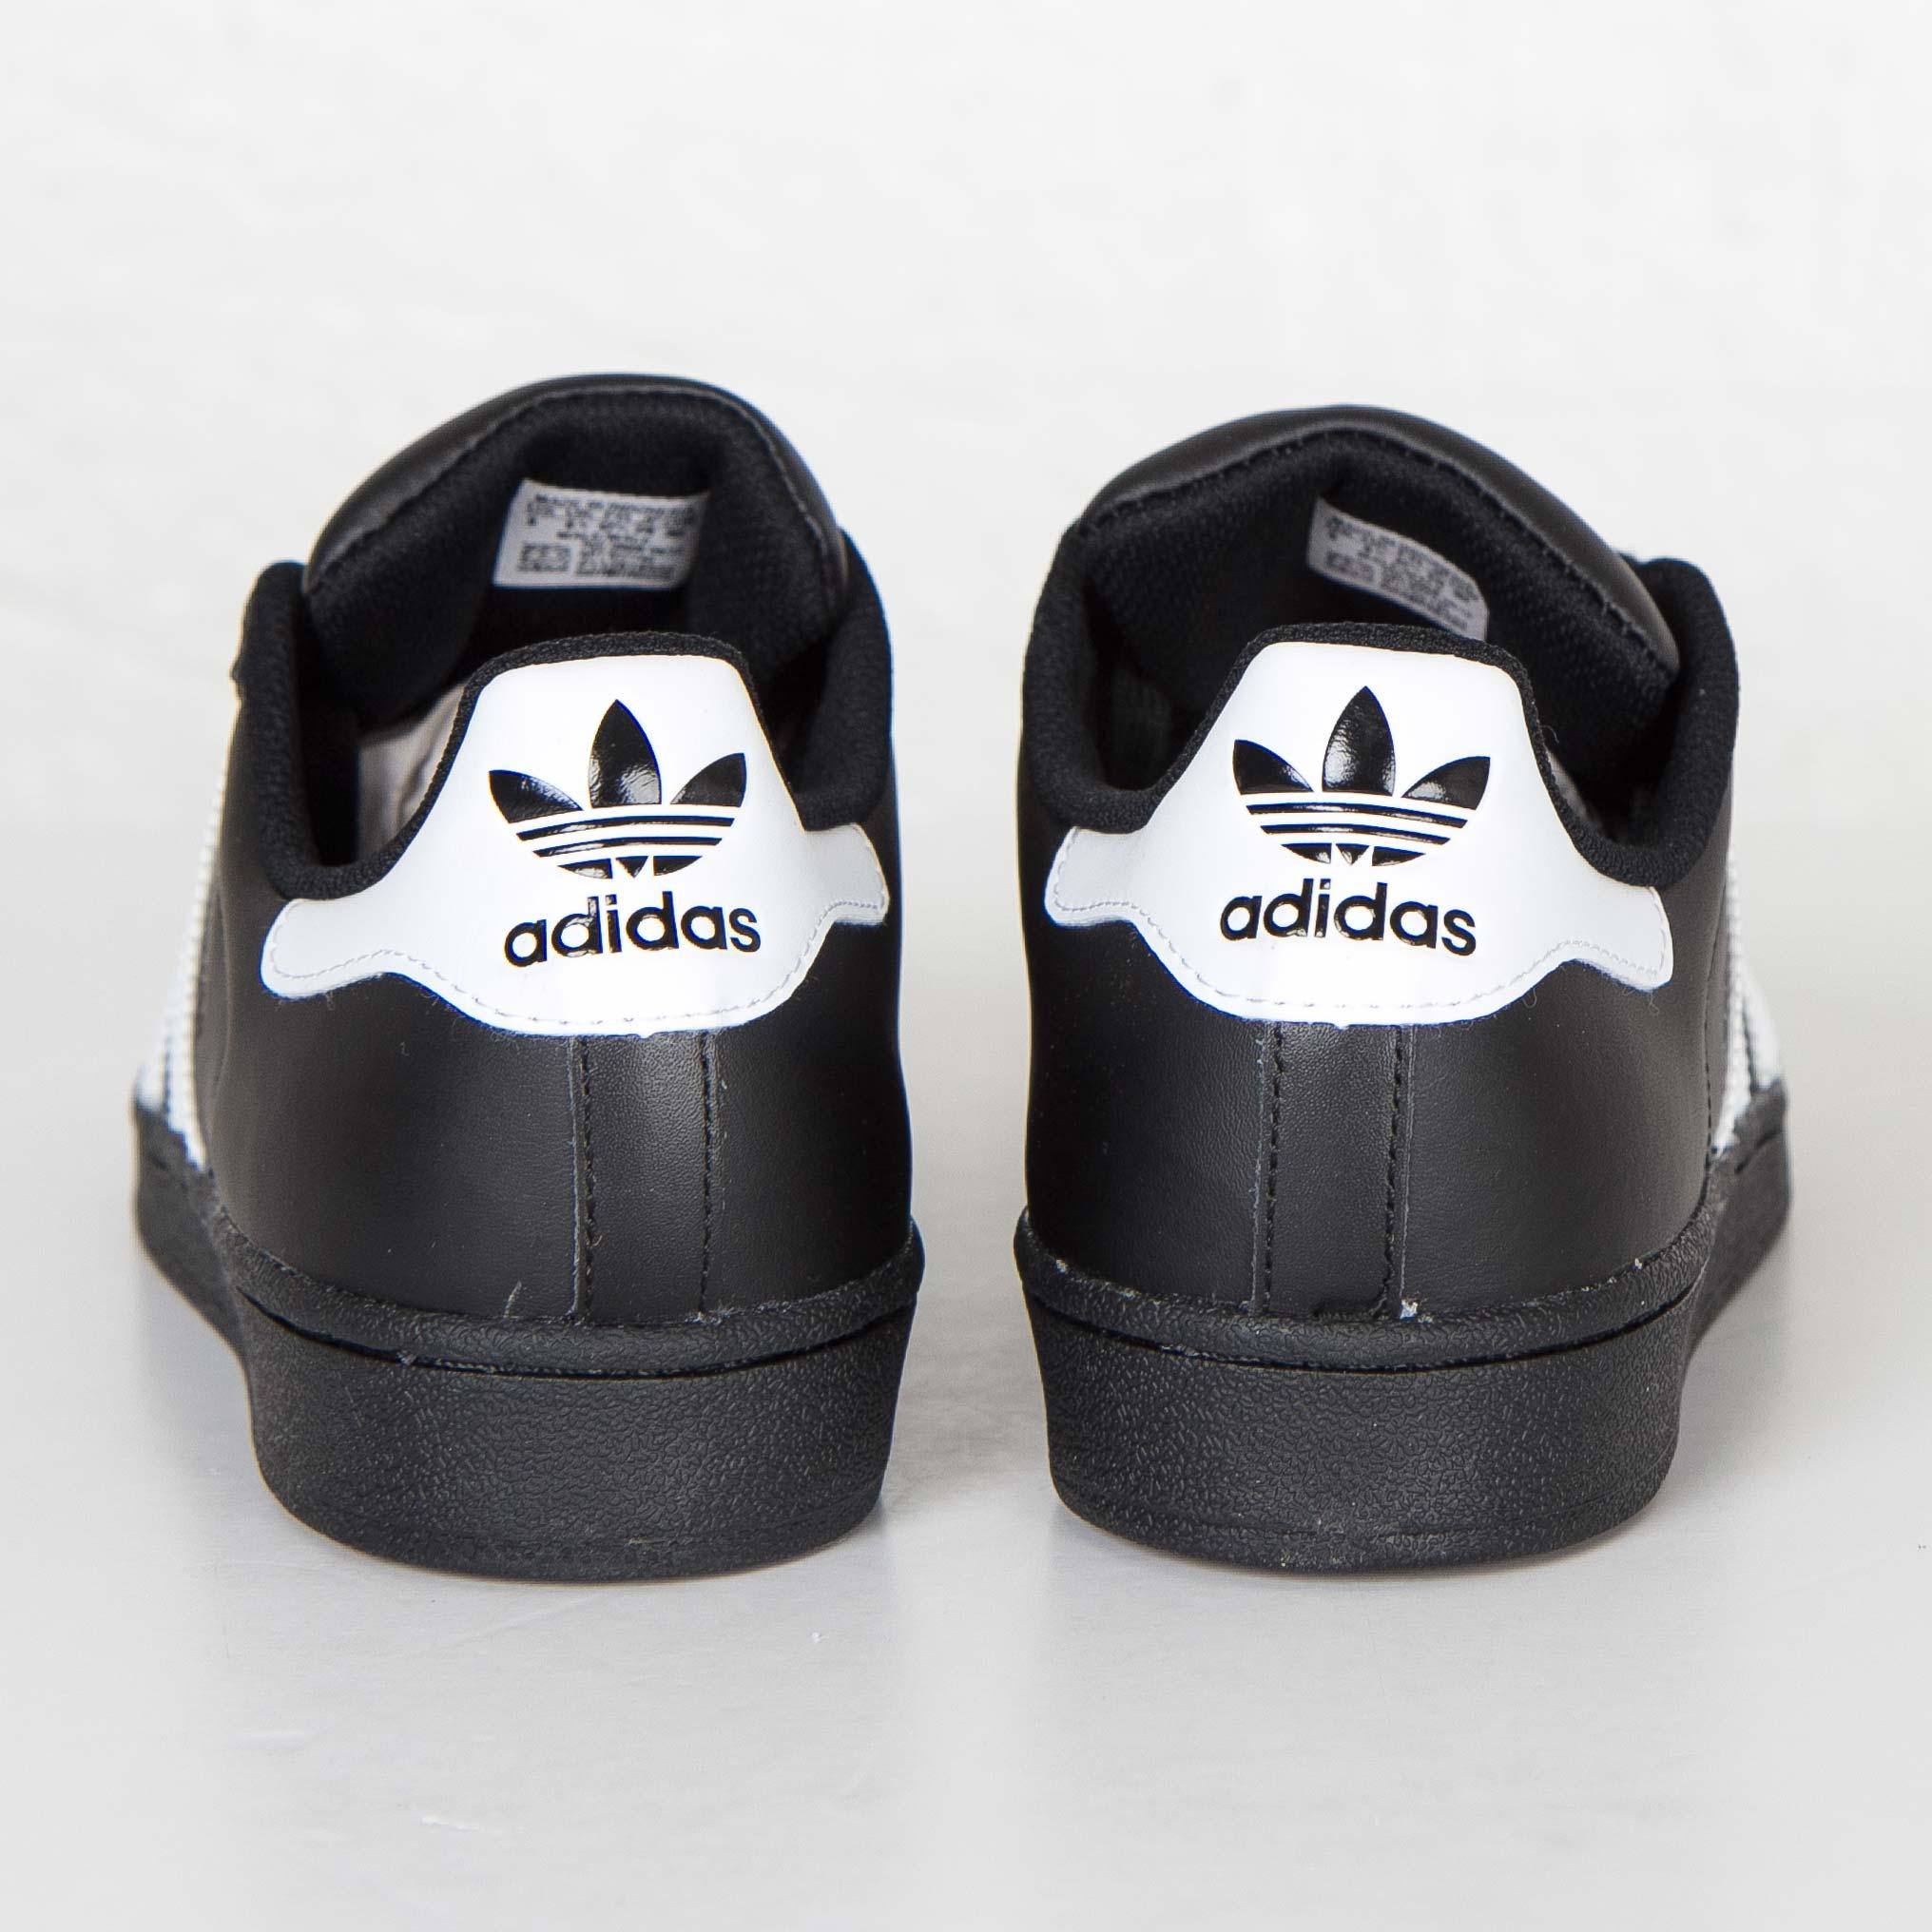 explique gráfico Caracterizar  adidas Superstar Foundation - B27140 - Sneakersnstuff | sneakers &  streetwear på nätet sen 1999